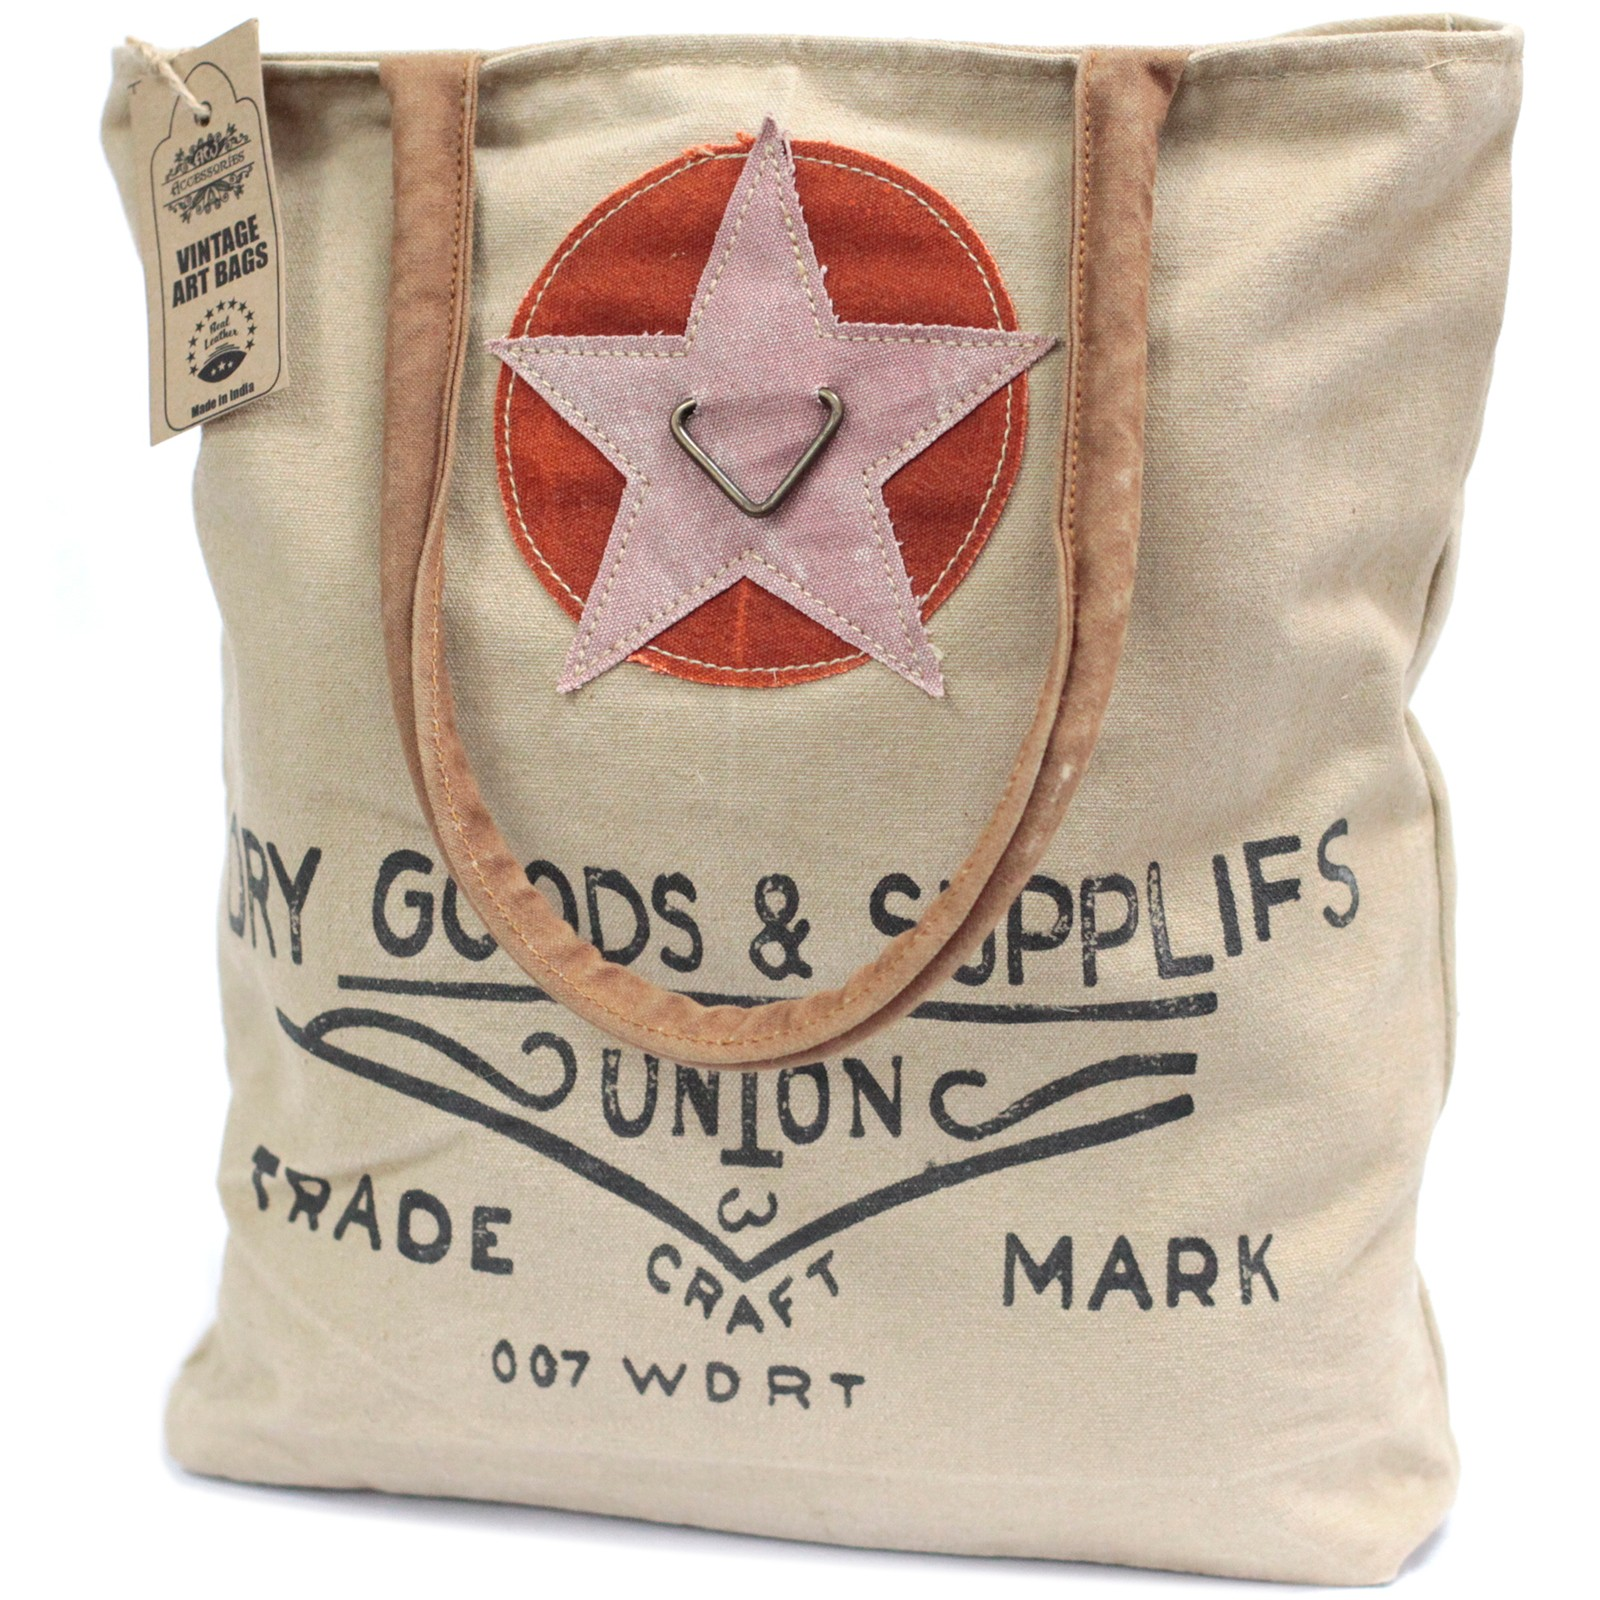 Vintage Bag Dry Goods   Supplies